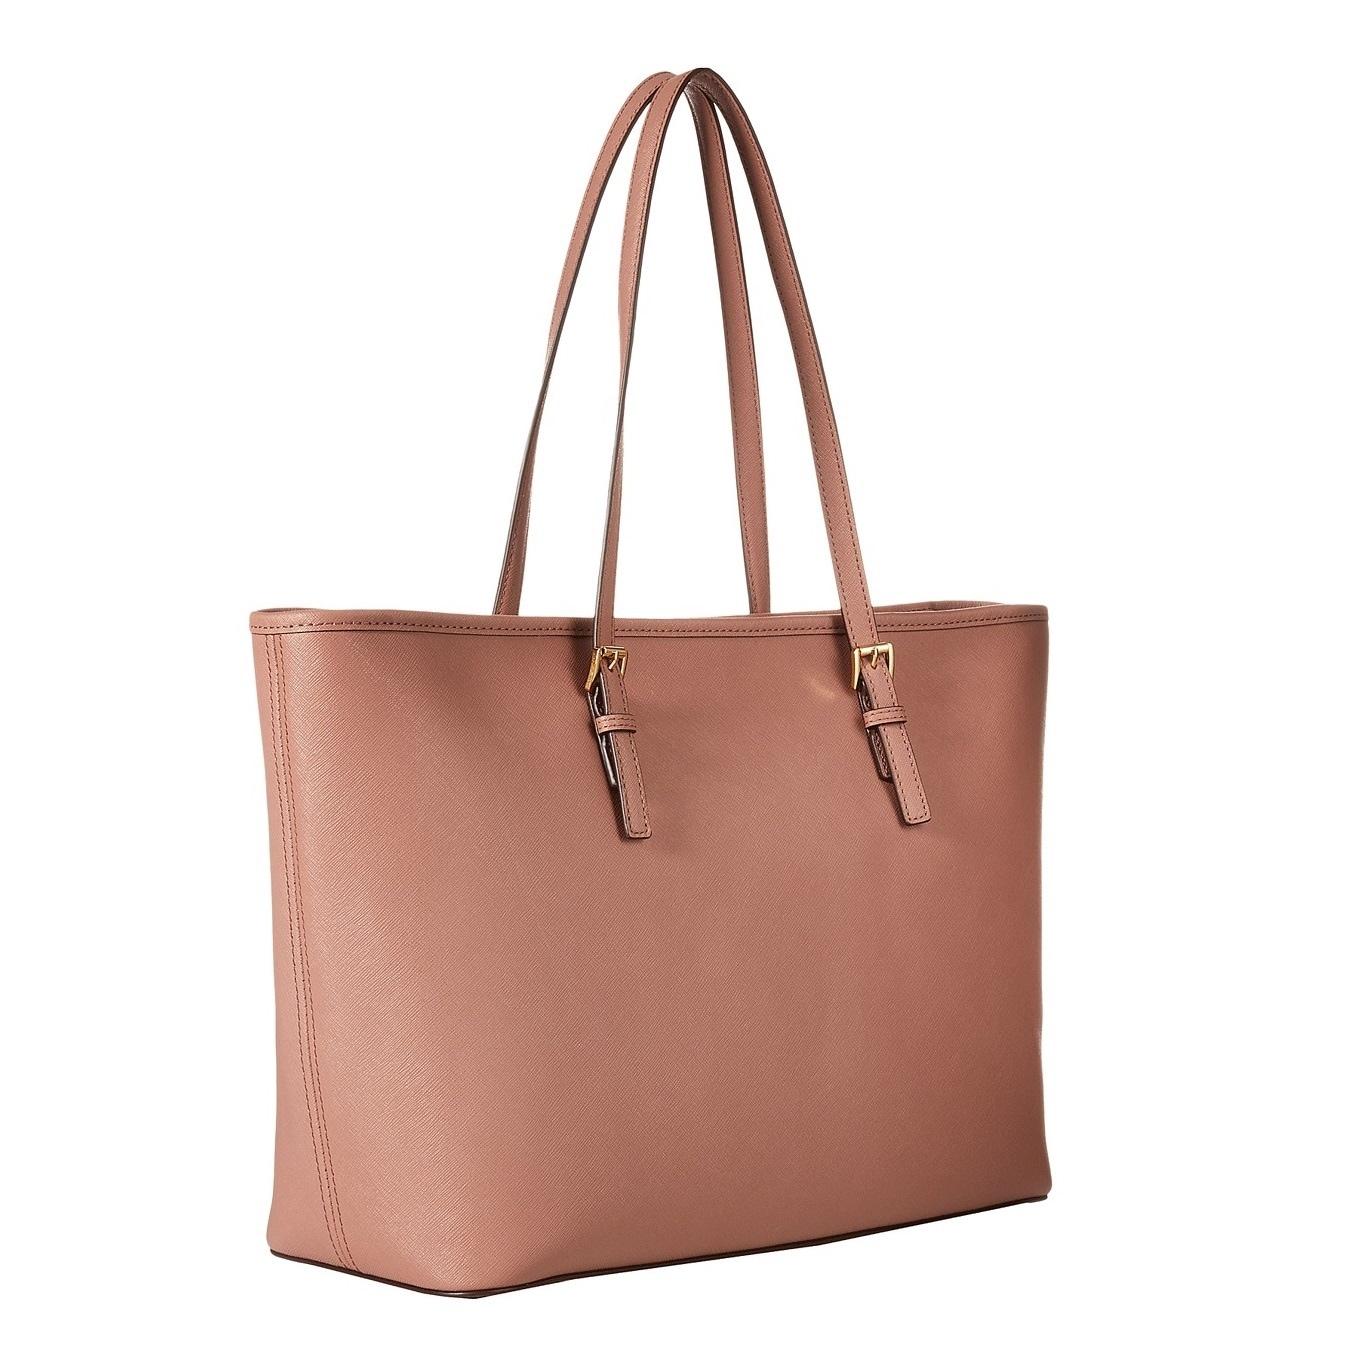 Michael Kors Jet Set Medium Saffiano Leather Tote Bag